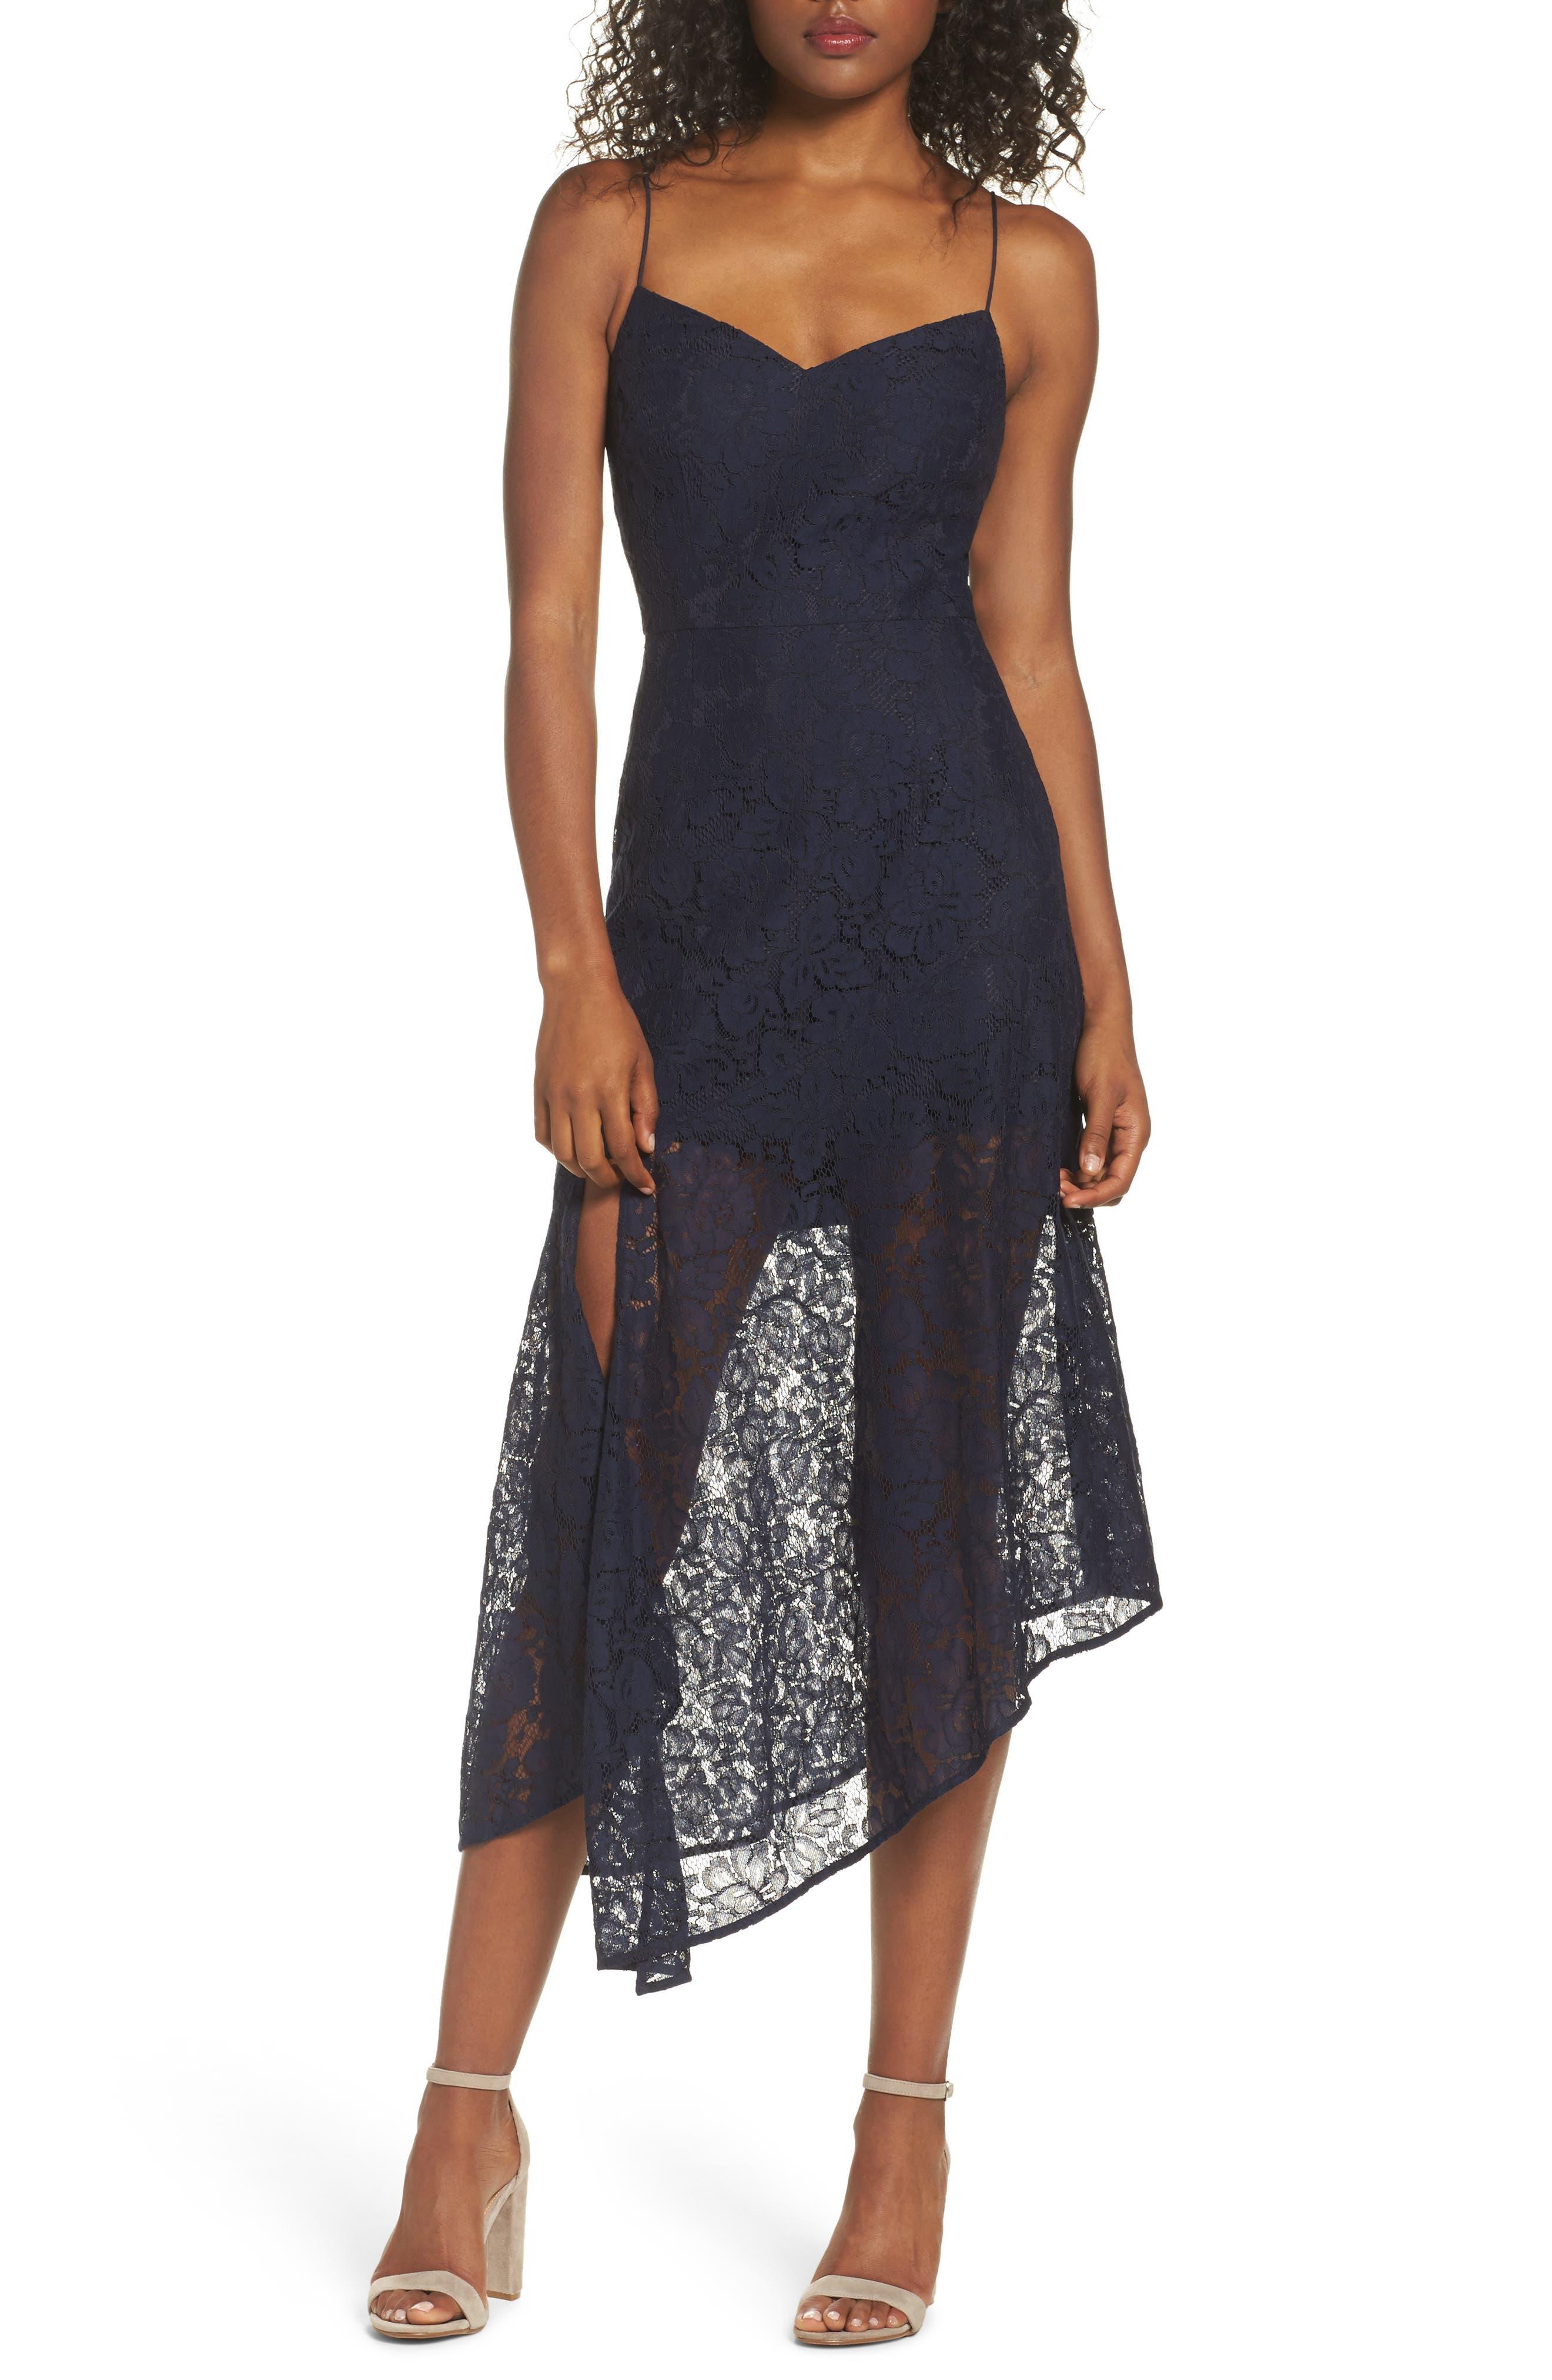 COOPER ST Soho Lace Midi Dress